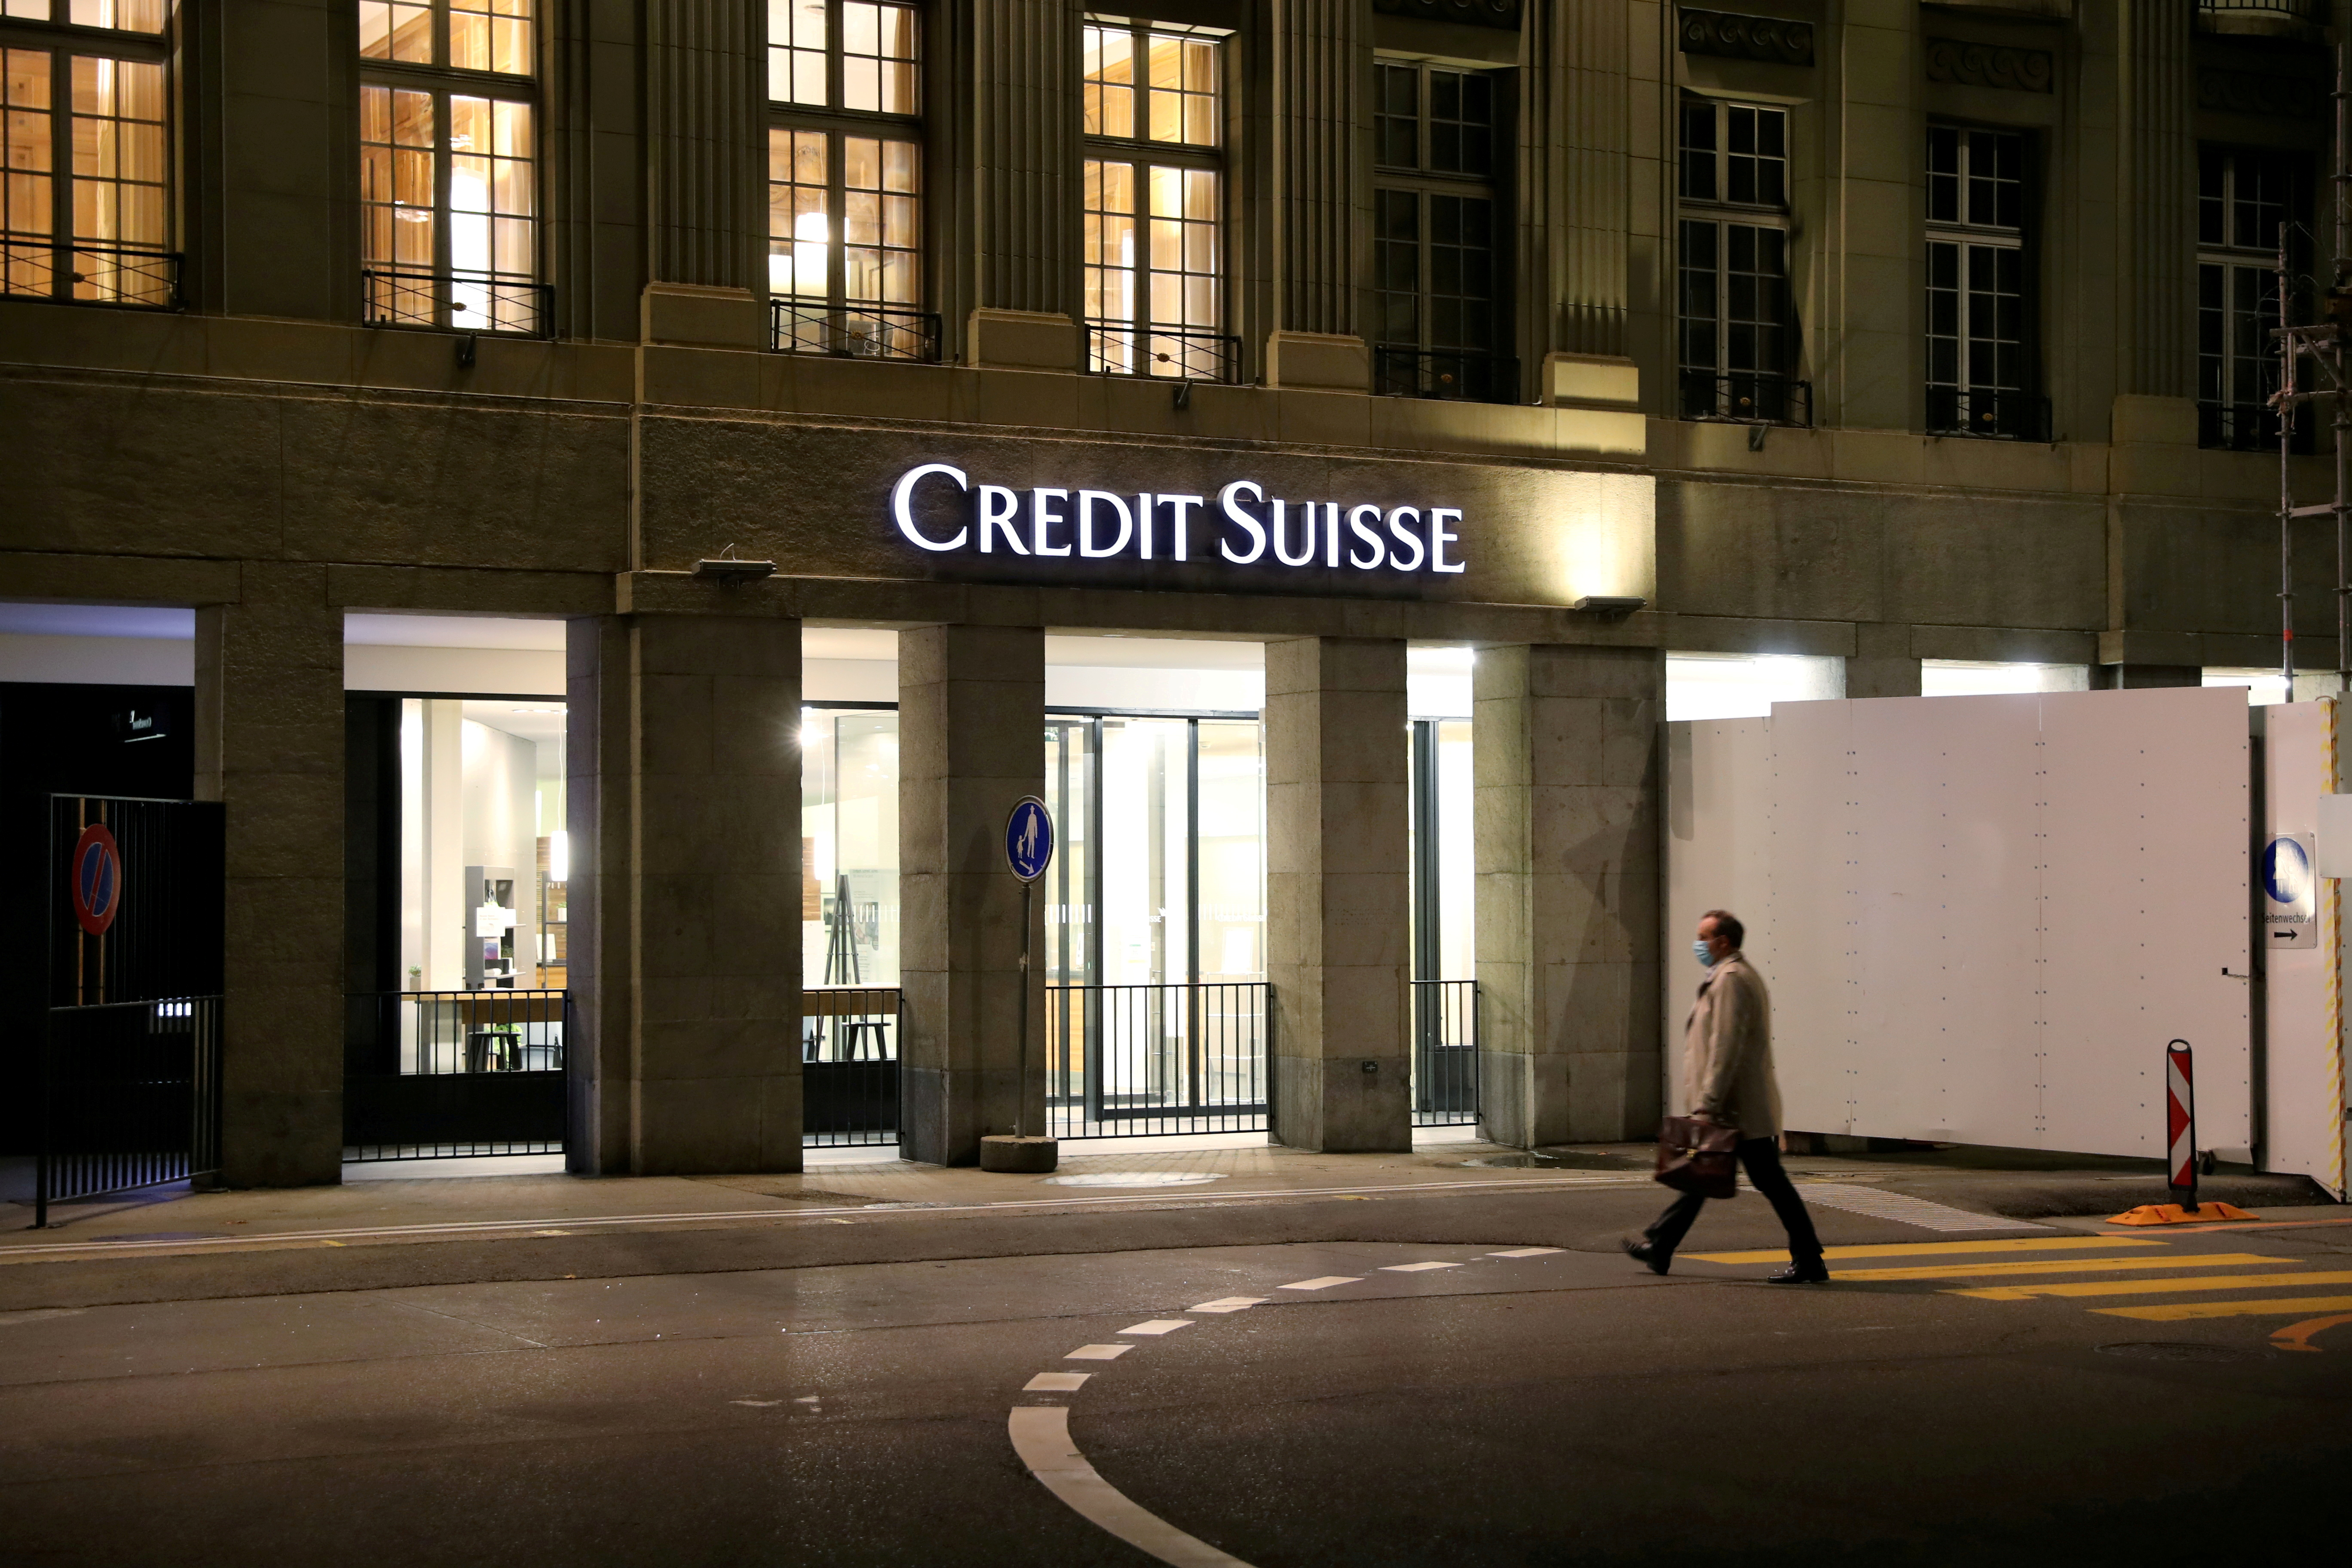 The logo of Swiss bank Credit Suisse is seen at a branch office in Bern, Switzerland, Oct. 28, 2020. REUTERS/Arnd Wiegmann